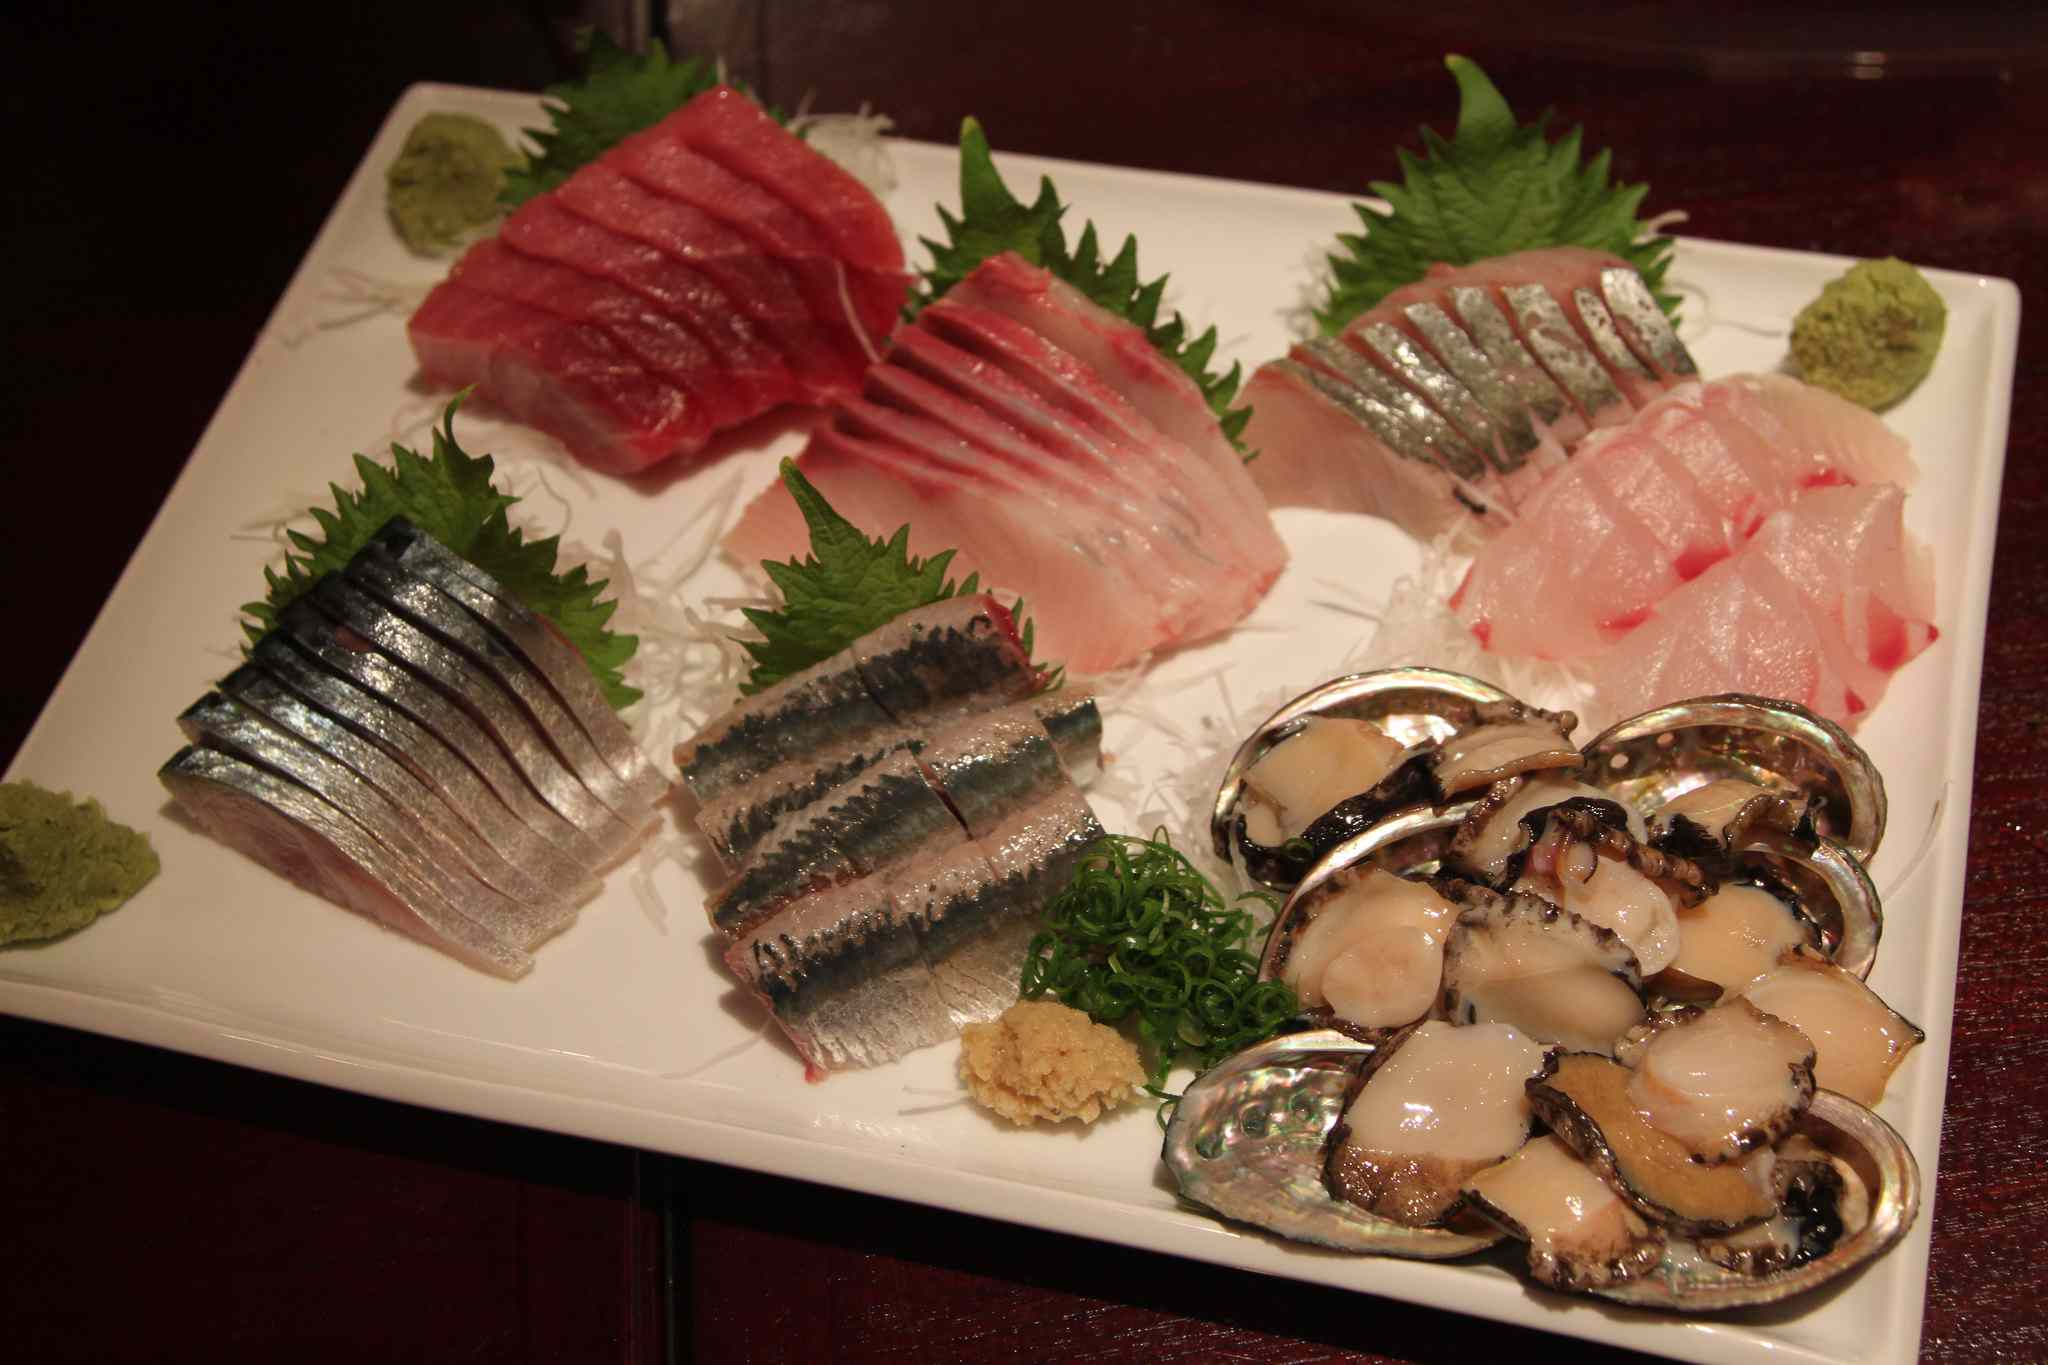 Sushi II, Hawaii—Jimoto Mebachi Maguro Chu Toro, Hamachi, Shima Aji, Opakapaka, Awabi, Iwashi and Saba Sashimi (starting from top left, going clockwise)